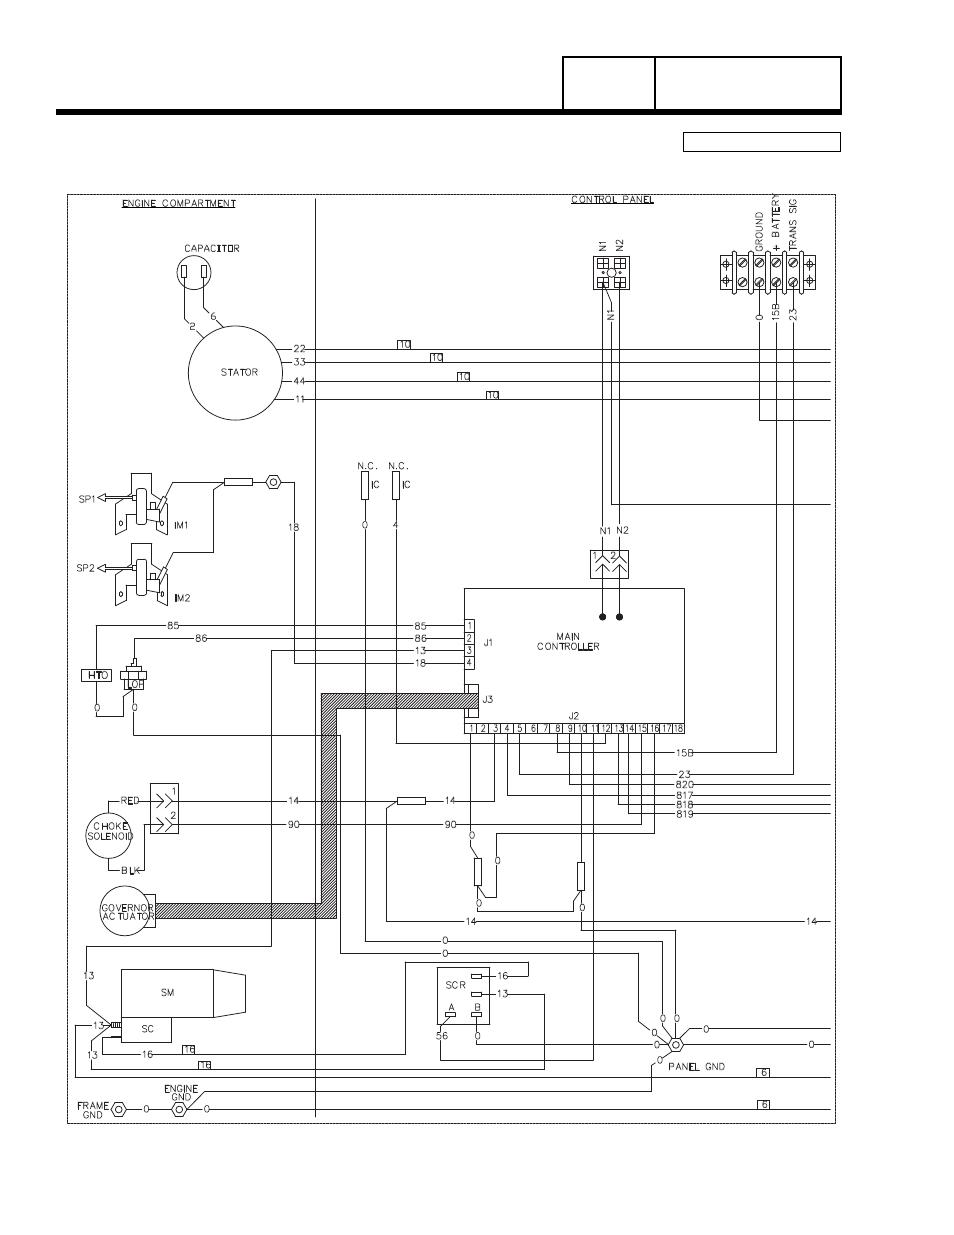 Diagram 8 Kw Generac Wiring Diagram Full Version Hd Quality Wiring Diagram Diagramcovinh Gisbertovalori It